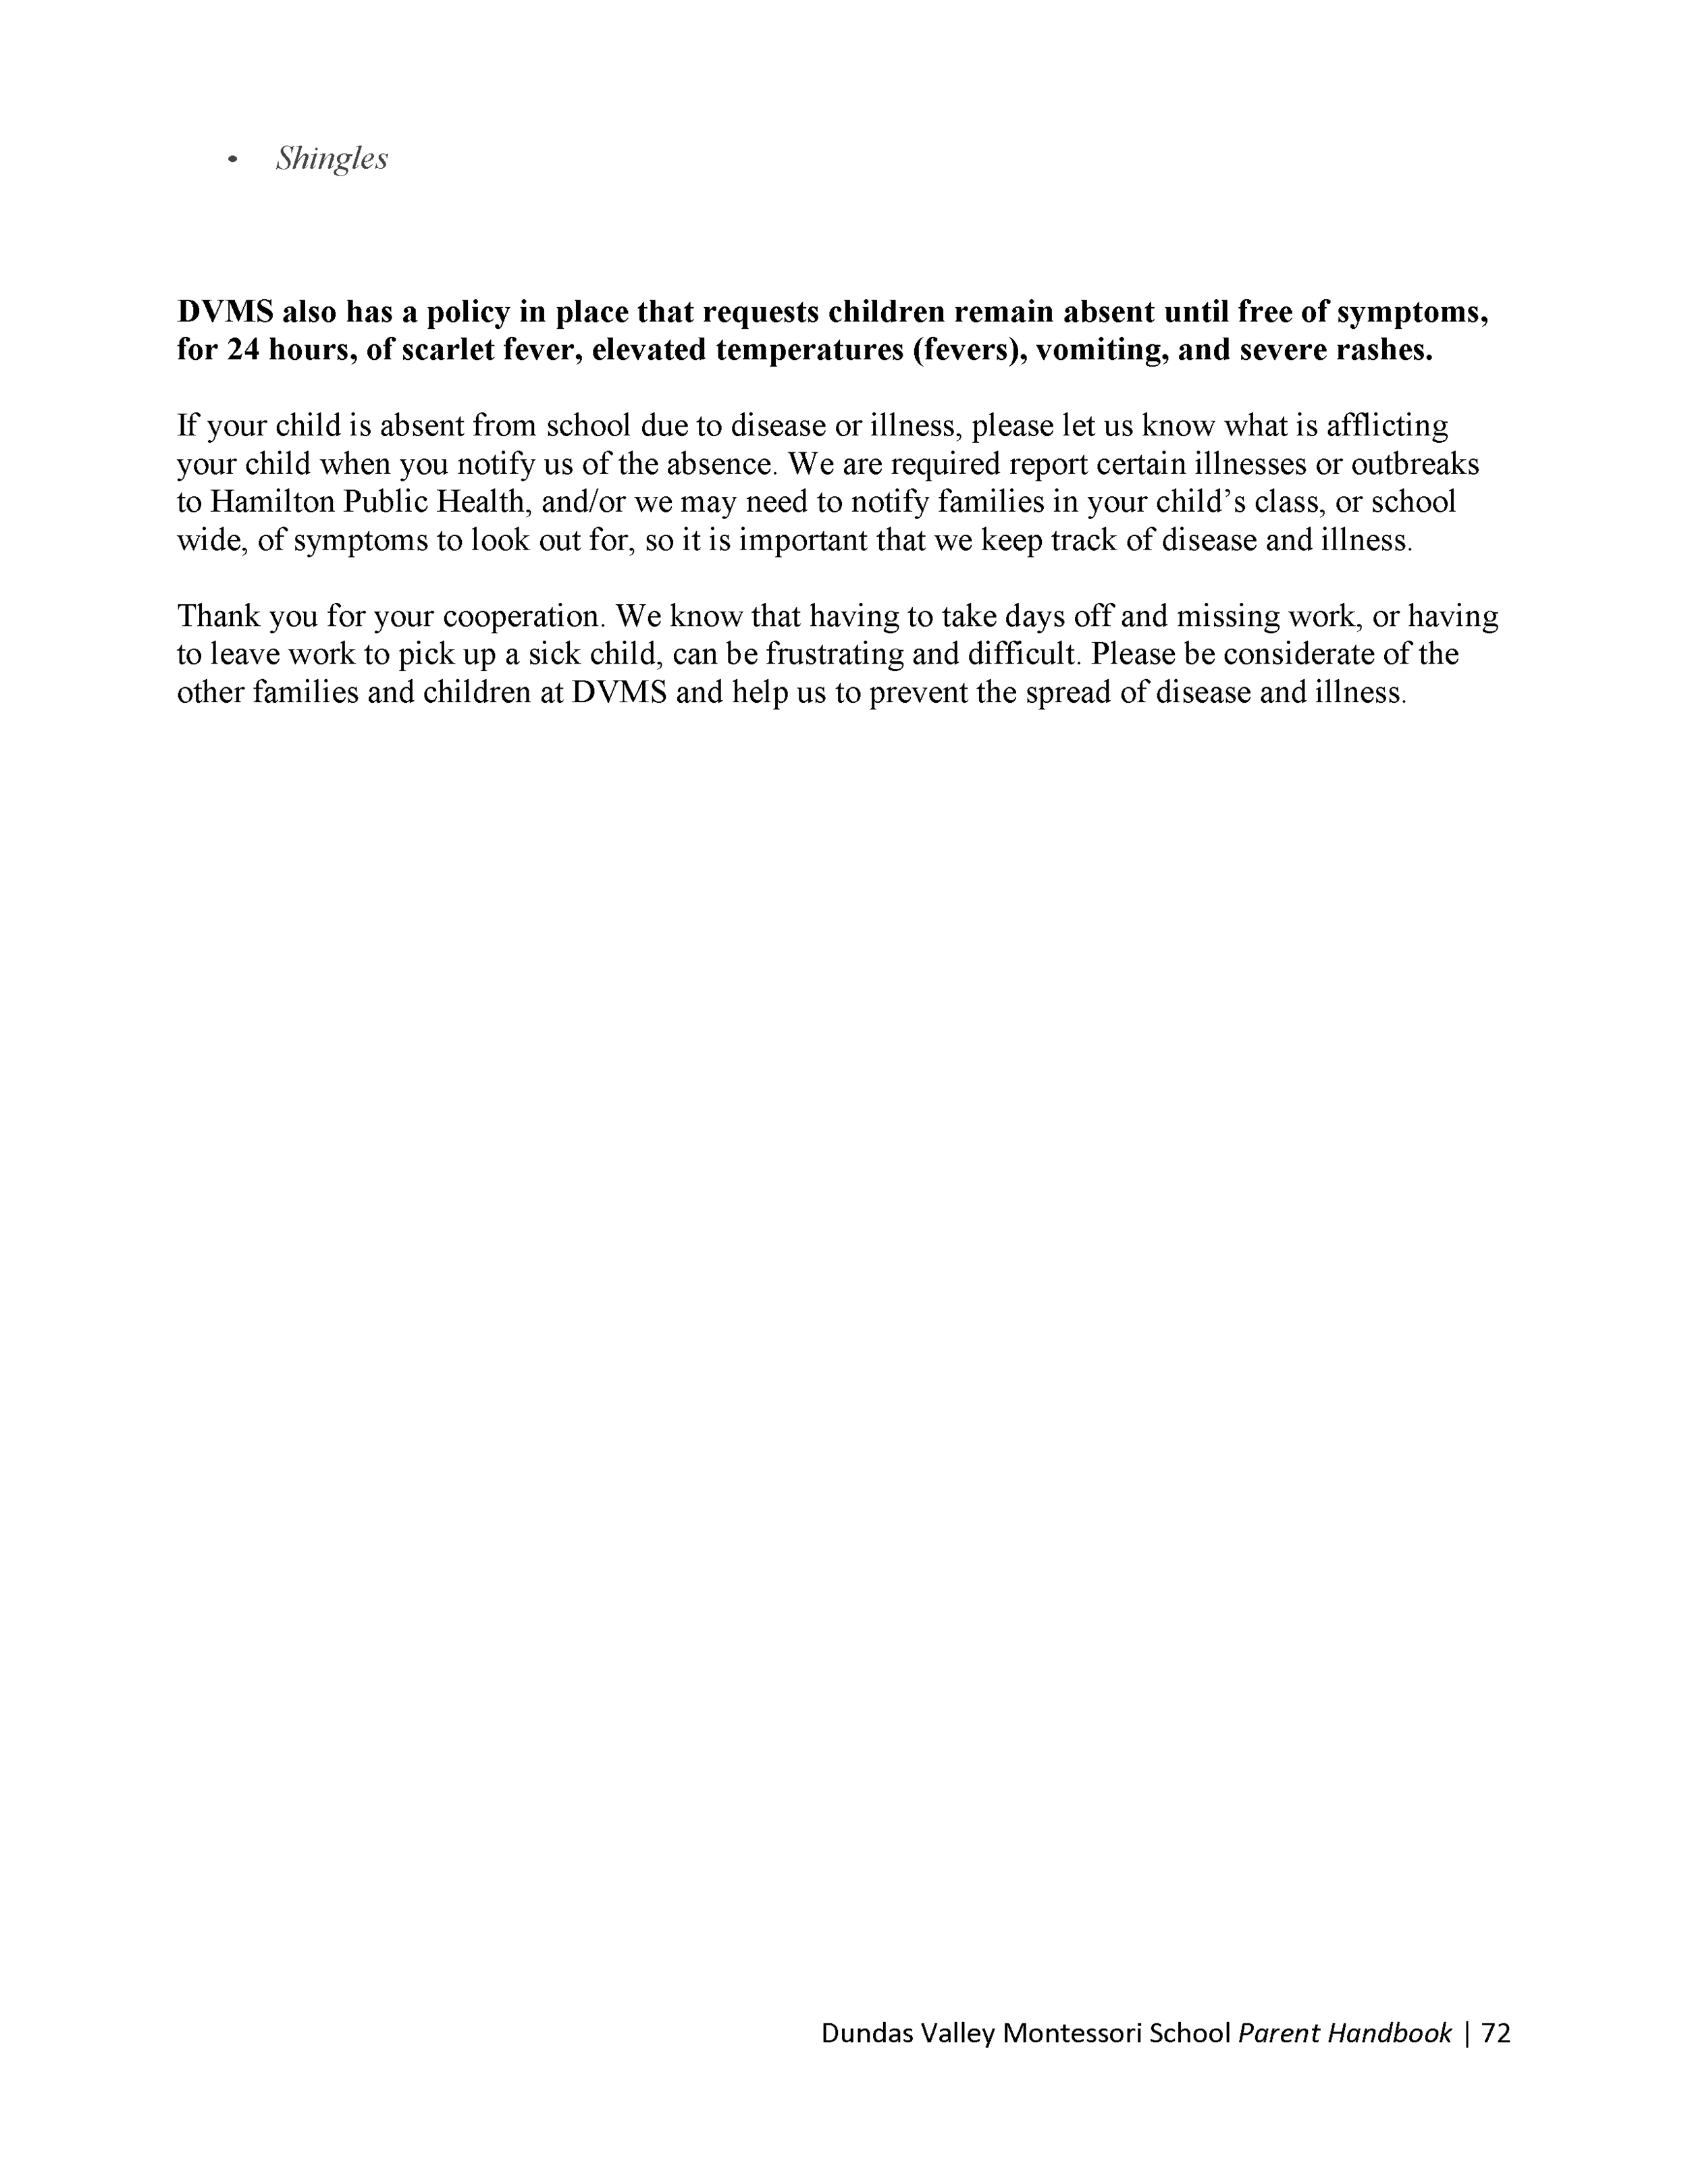 DVMS-Parent-Handbook-19-20_Page_074.png